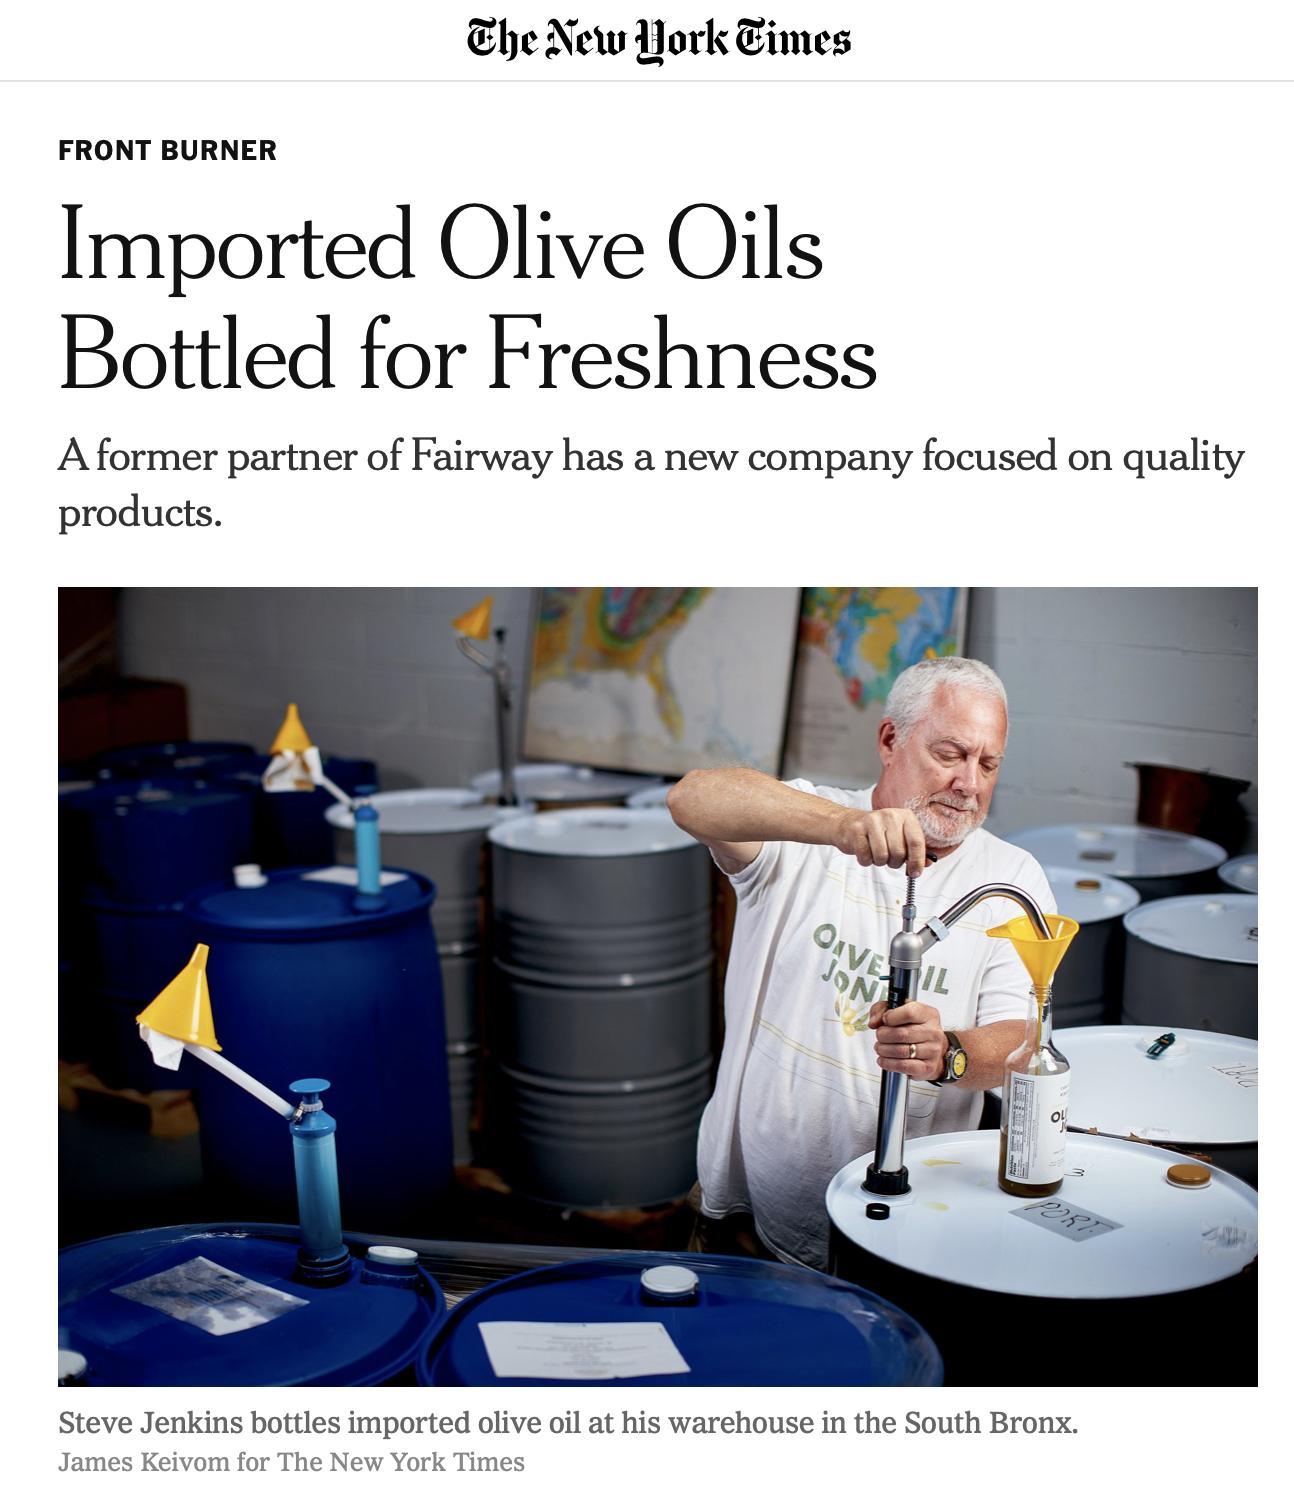 imported Olive Oils Bottled for Freshness